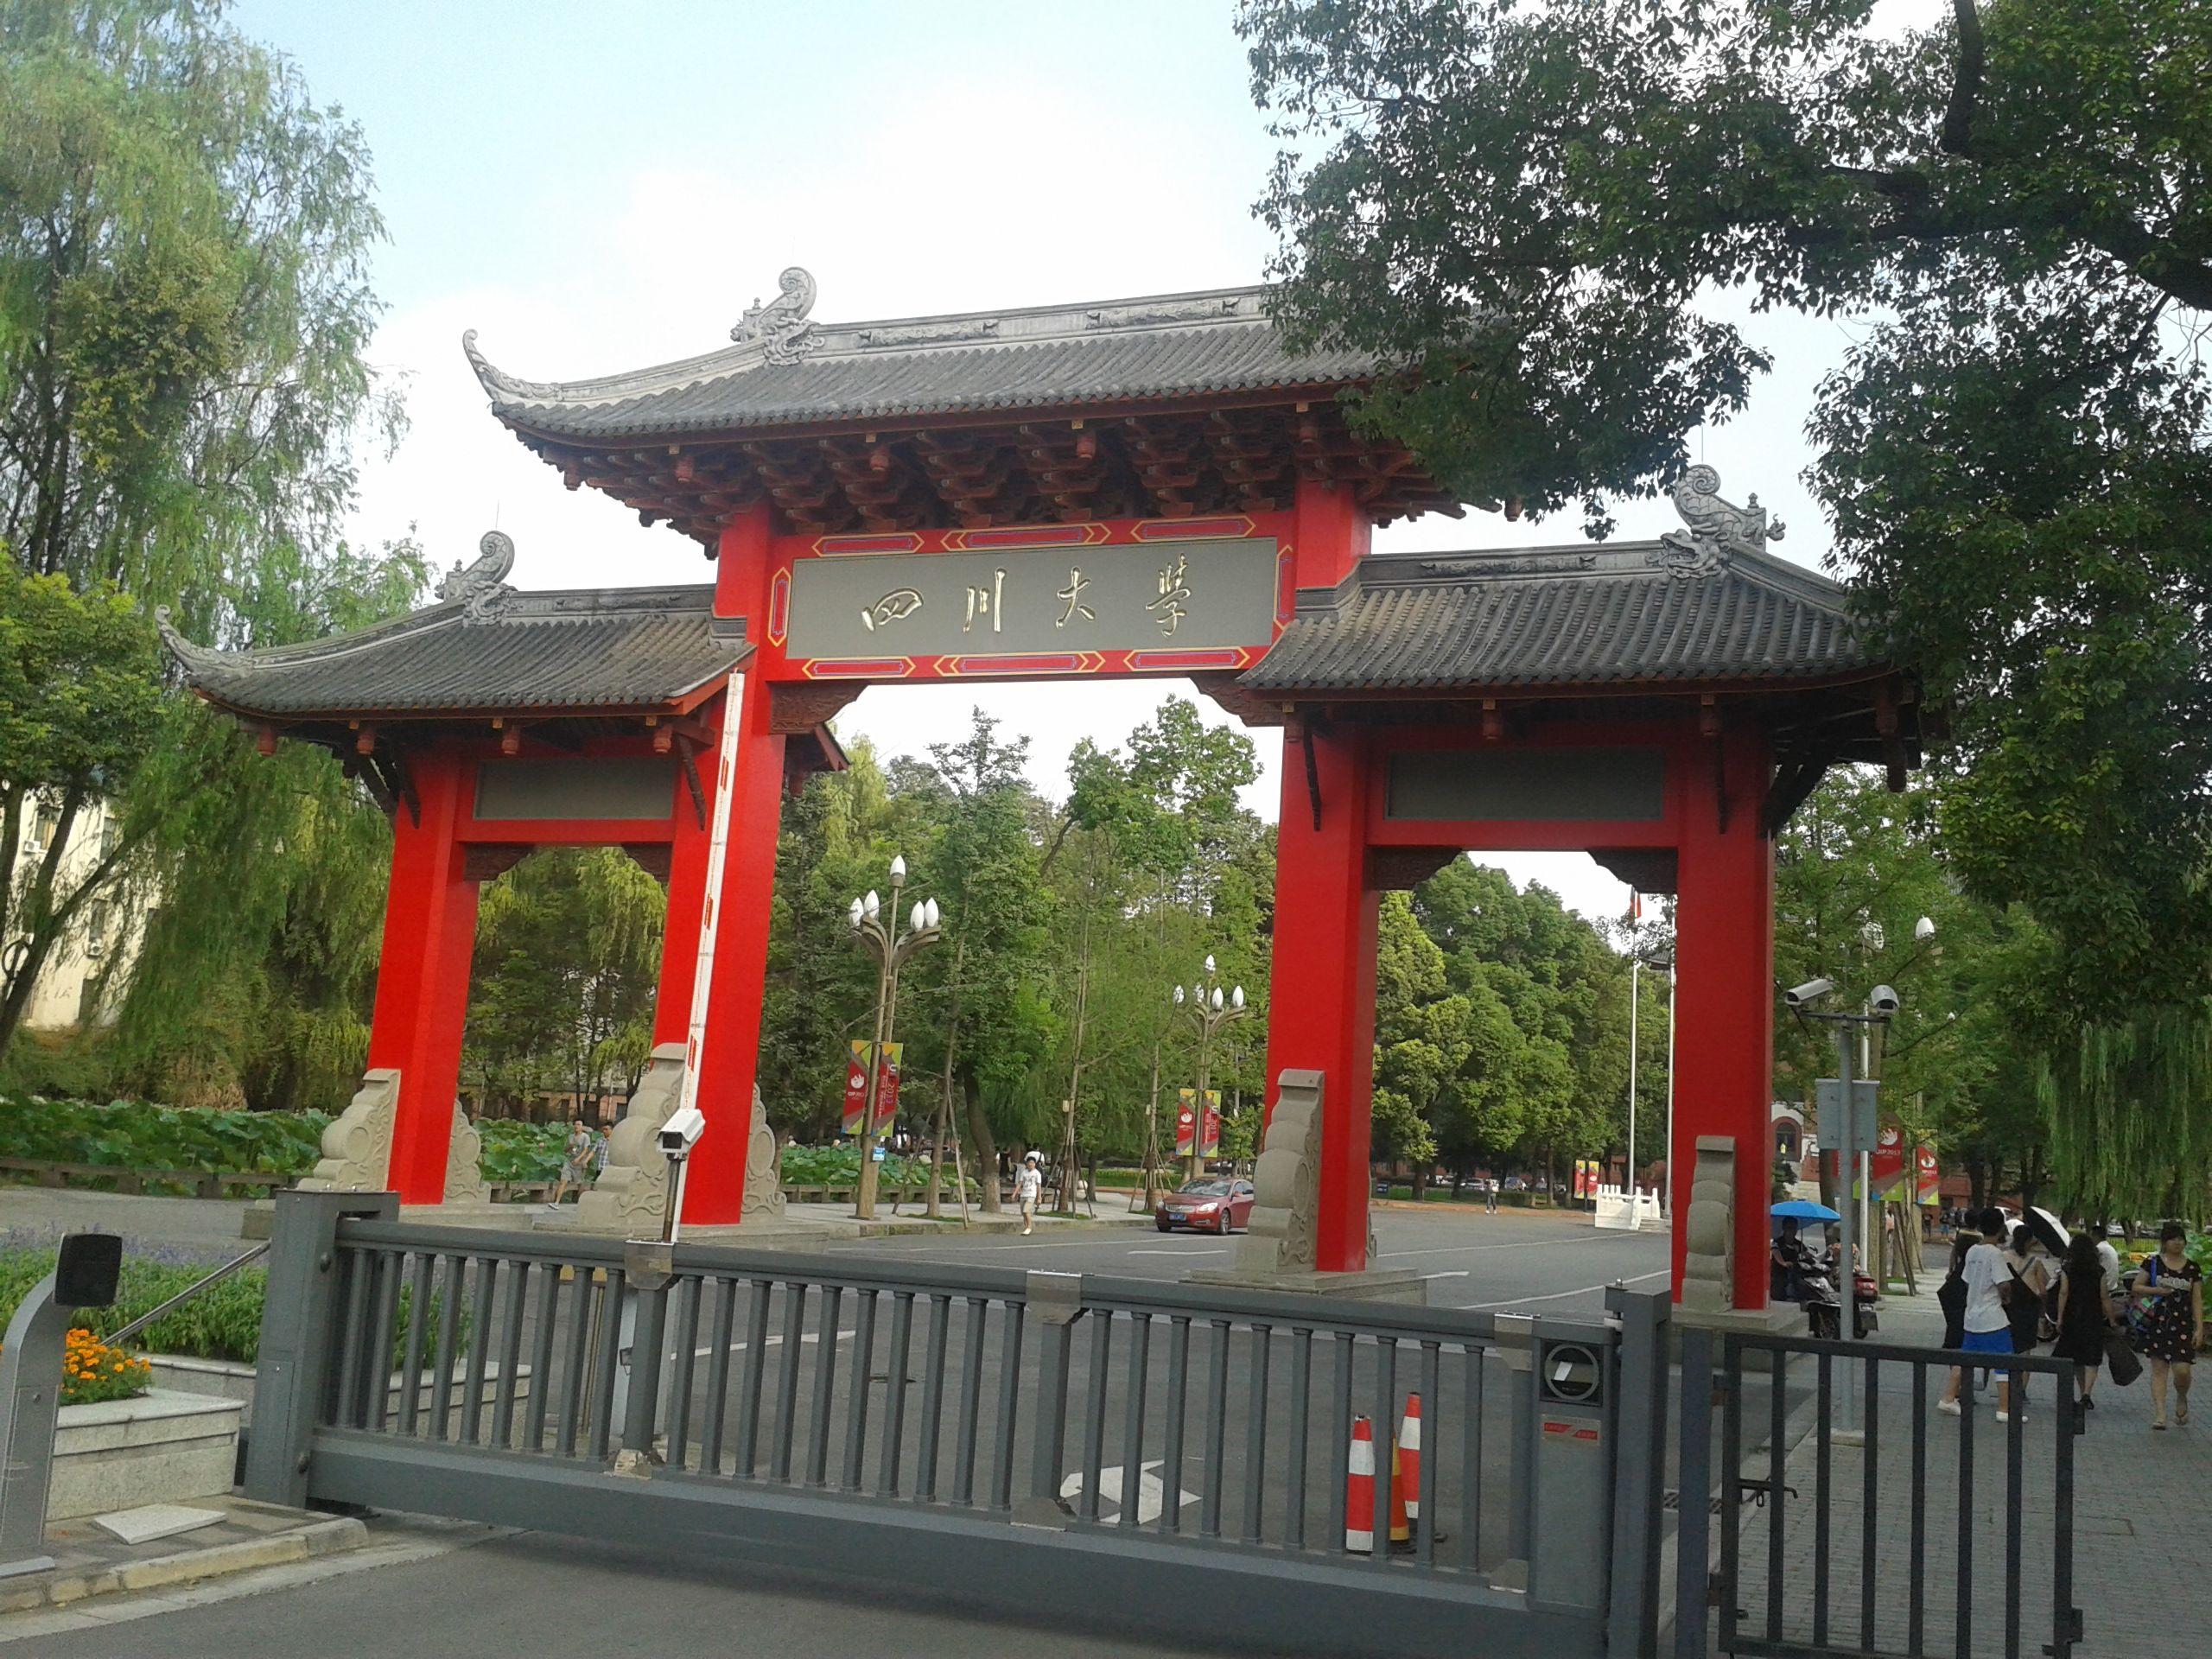 Chengdu Jingli & Kuanzhai Alley & Sichuan University